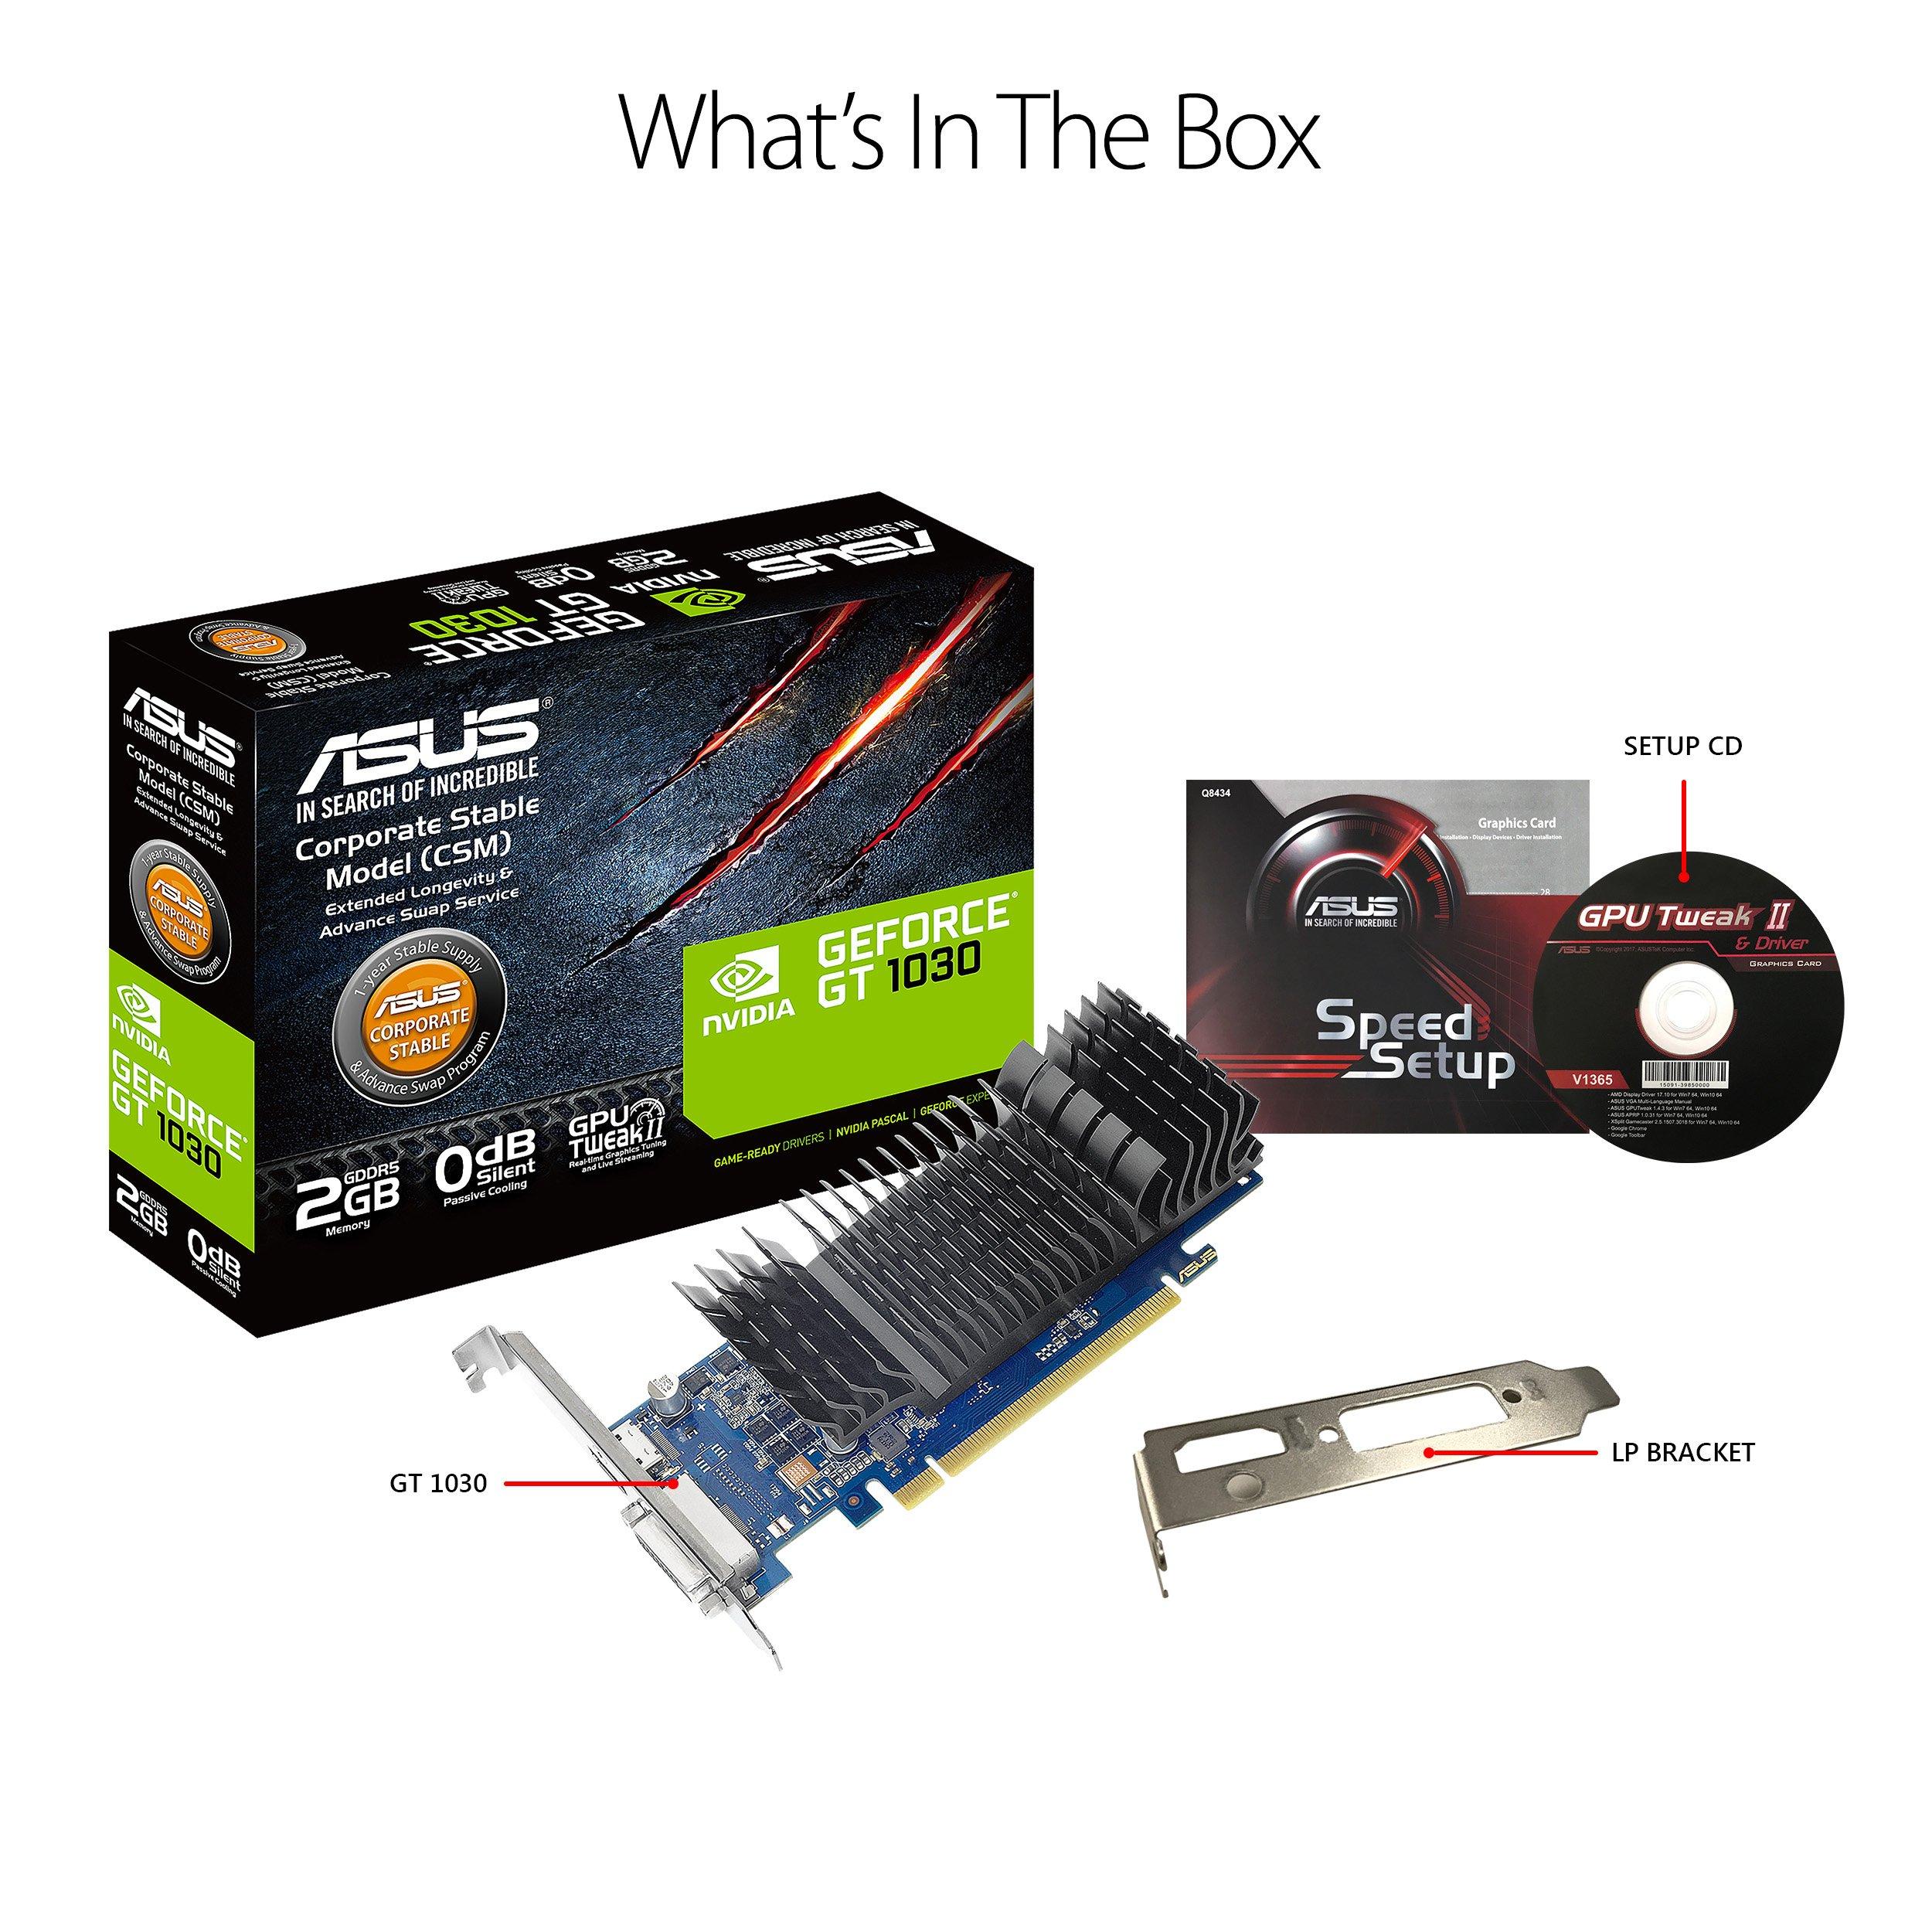 Asus GeForce GT 1030 2GB GDDR5 HDMI DVI Graphics Card (GT1030-2G-CSM) GT 1030 2GB Low Profile GT 1030